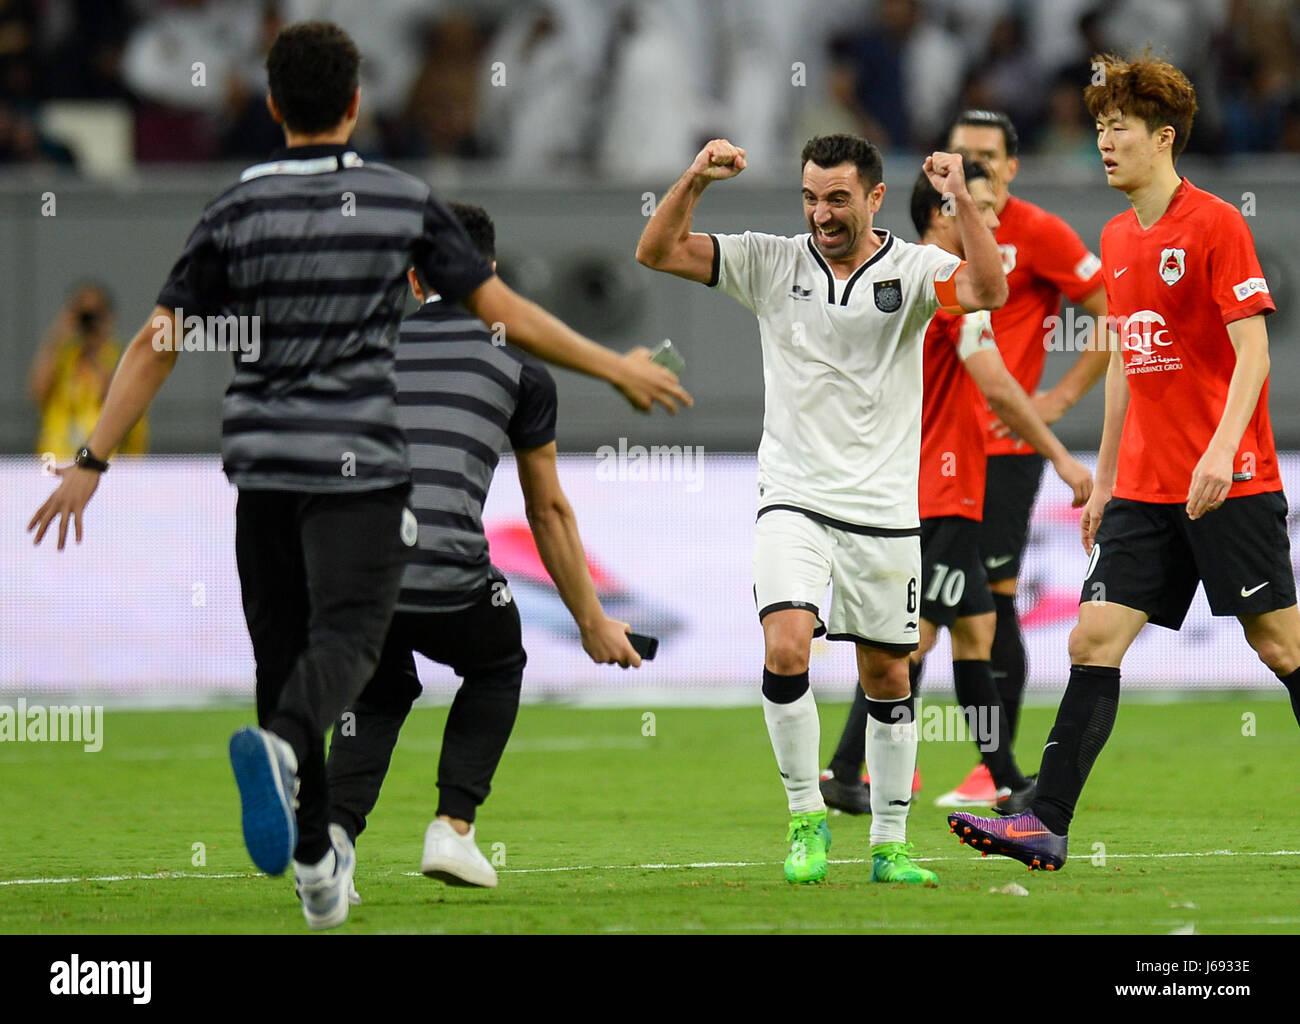 Doha, Qatar. 19th May, 2017. Xavi (3rd, L) of Al-Sadd celebrates with his teammates after winning the Qatar Emir Stock Photo